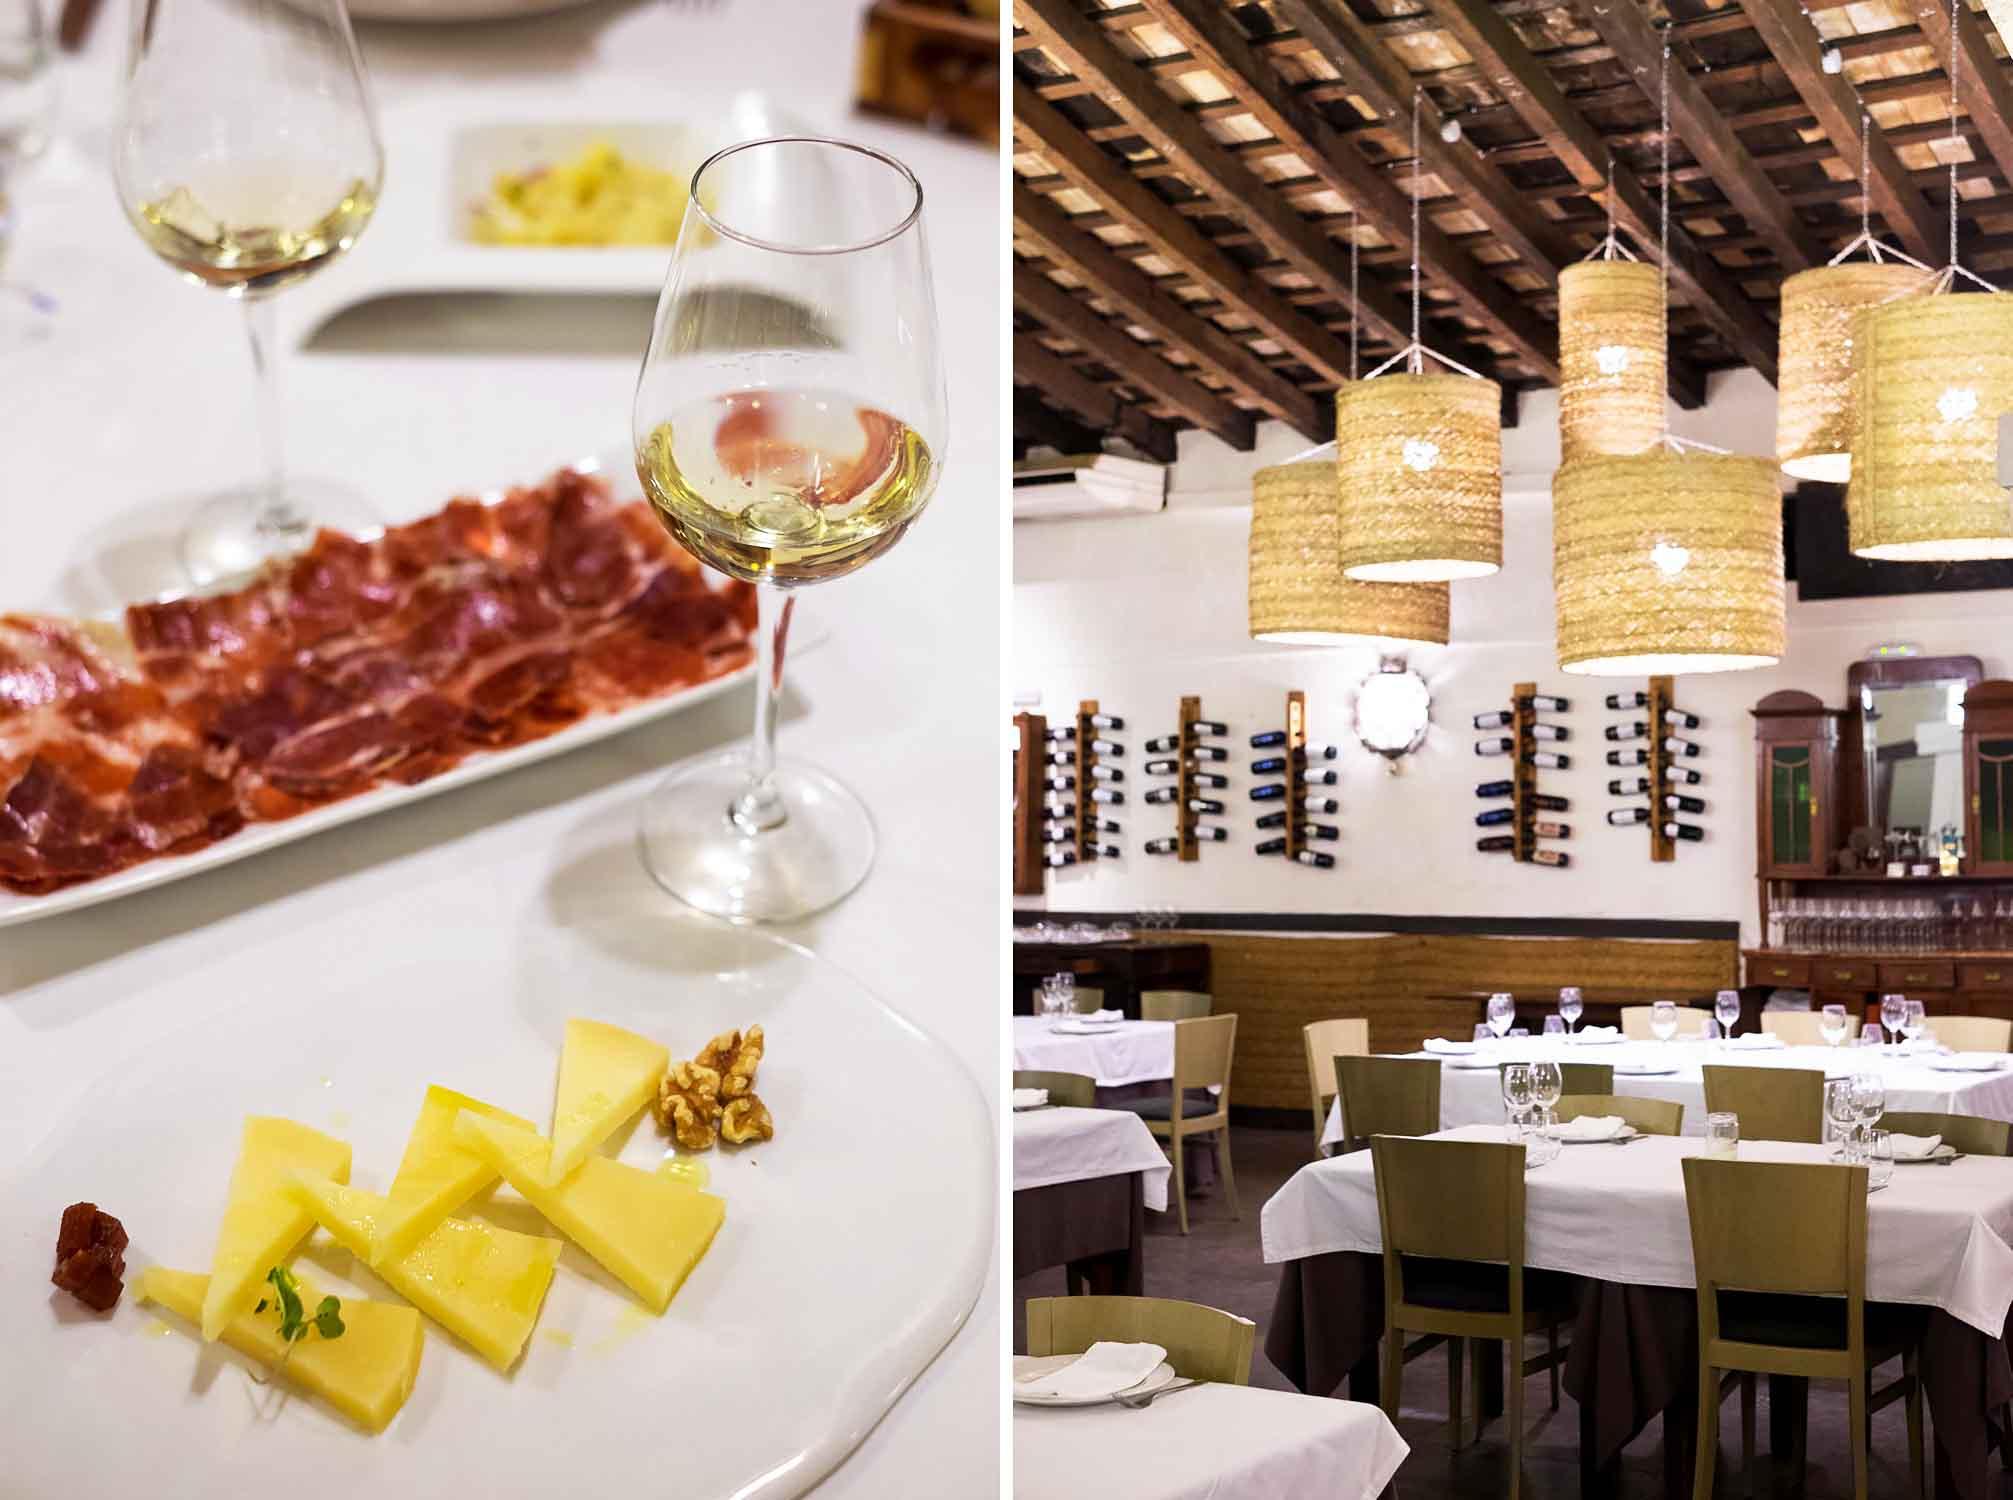 Dinner at La Carbona restaurant in Jerez de la Frontera, Spain